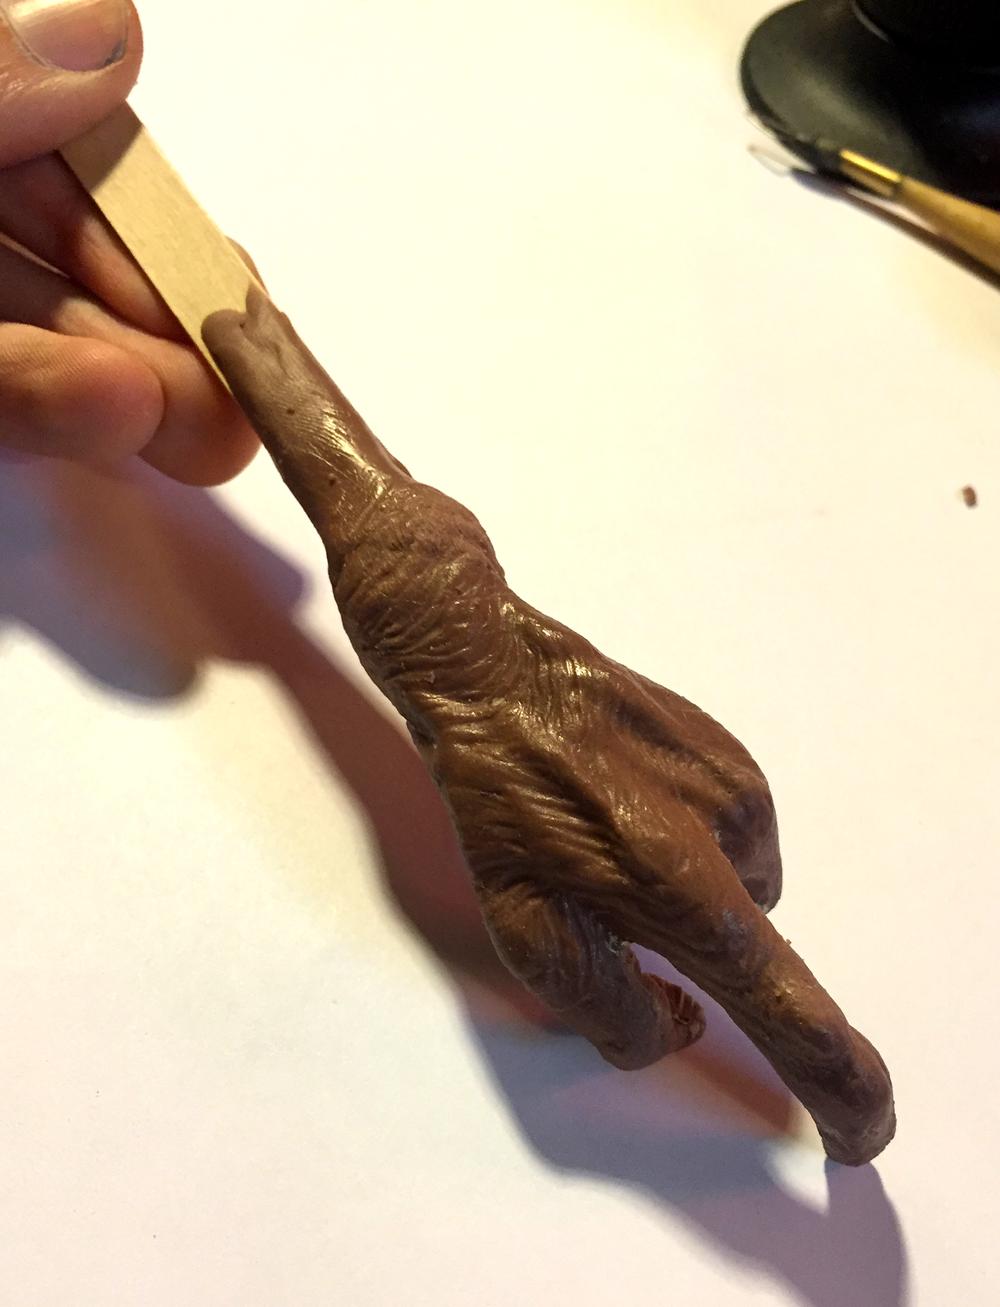 Goblin Hand